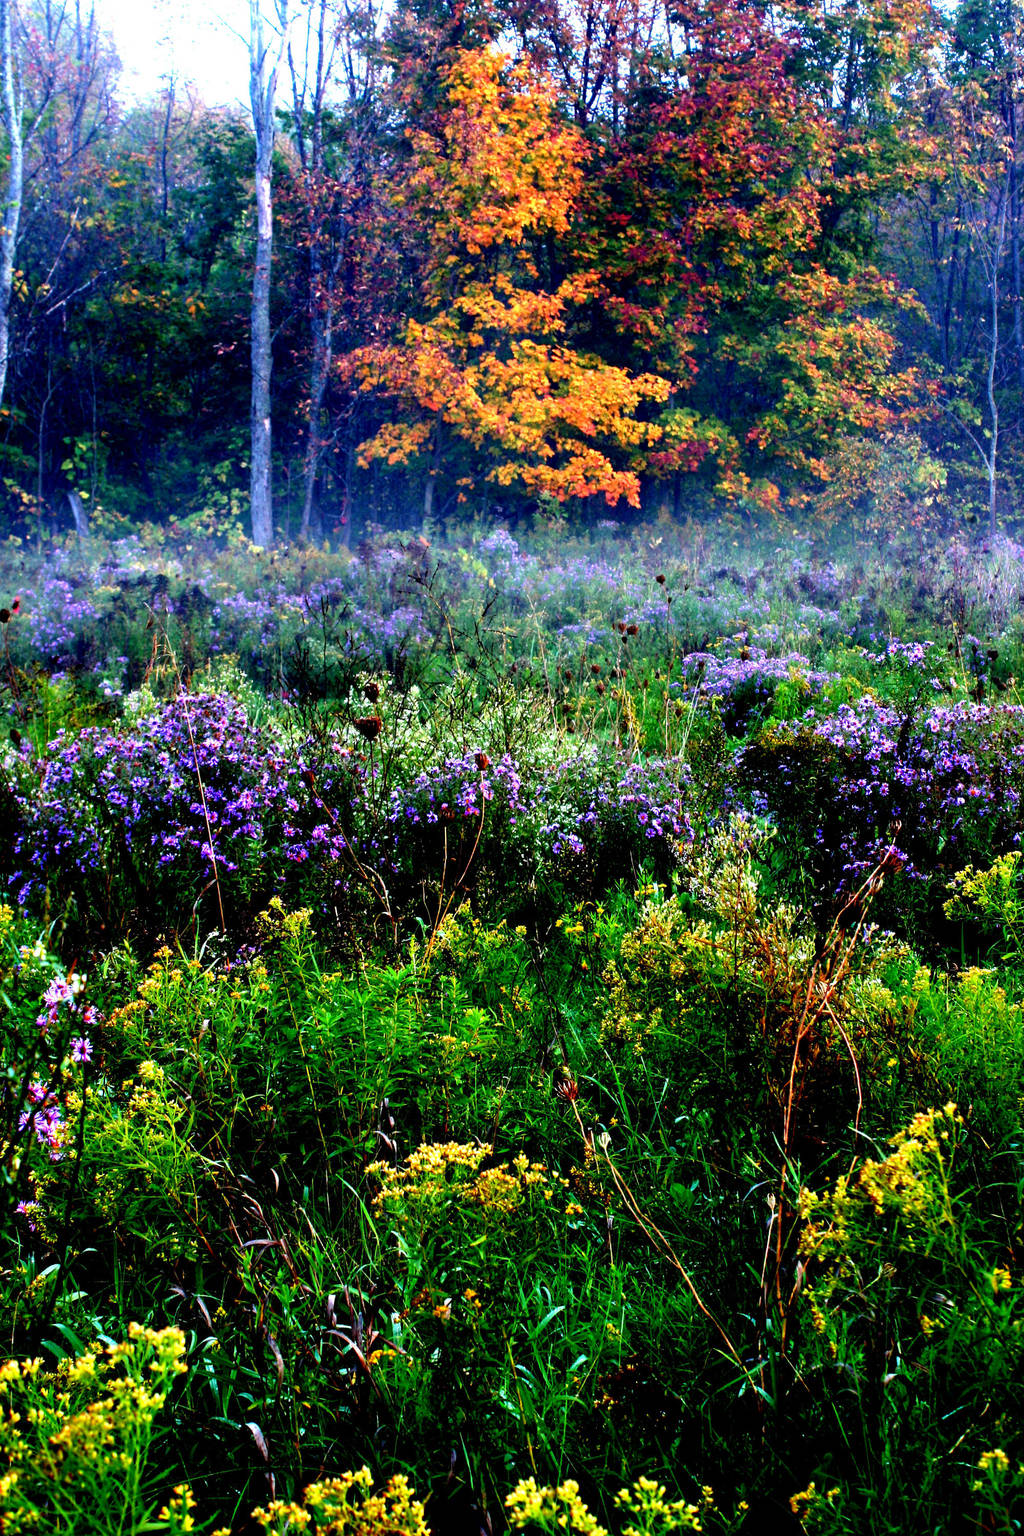 Misty Garden by Healer-Guy